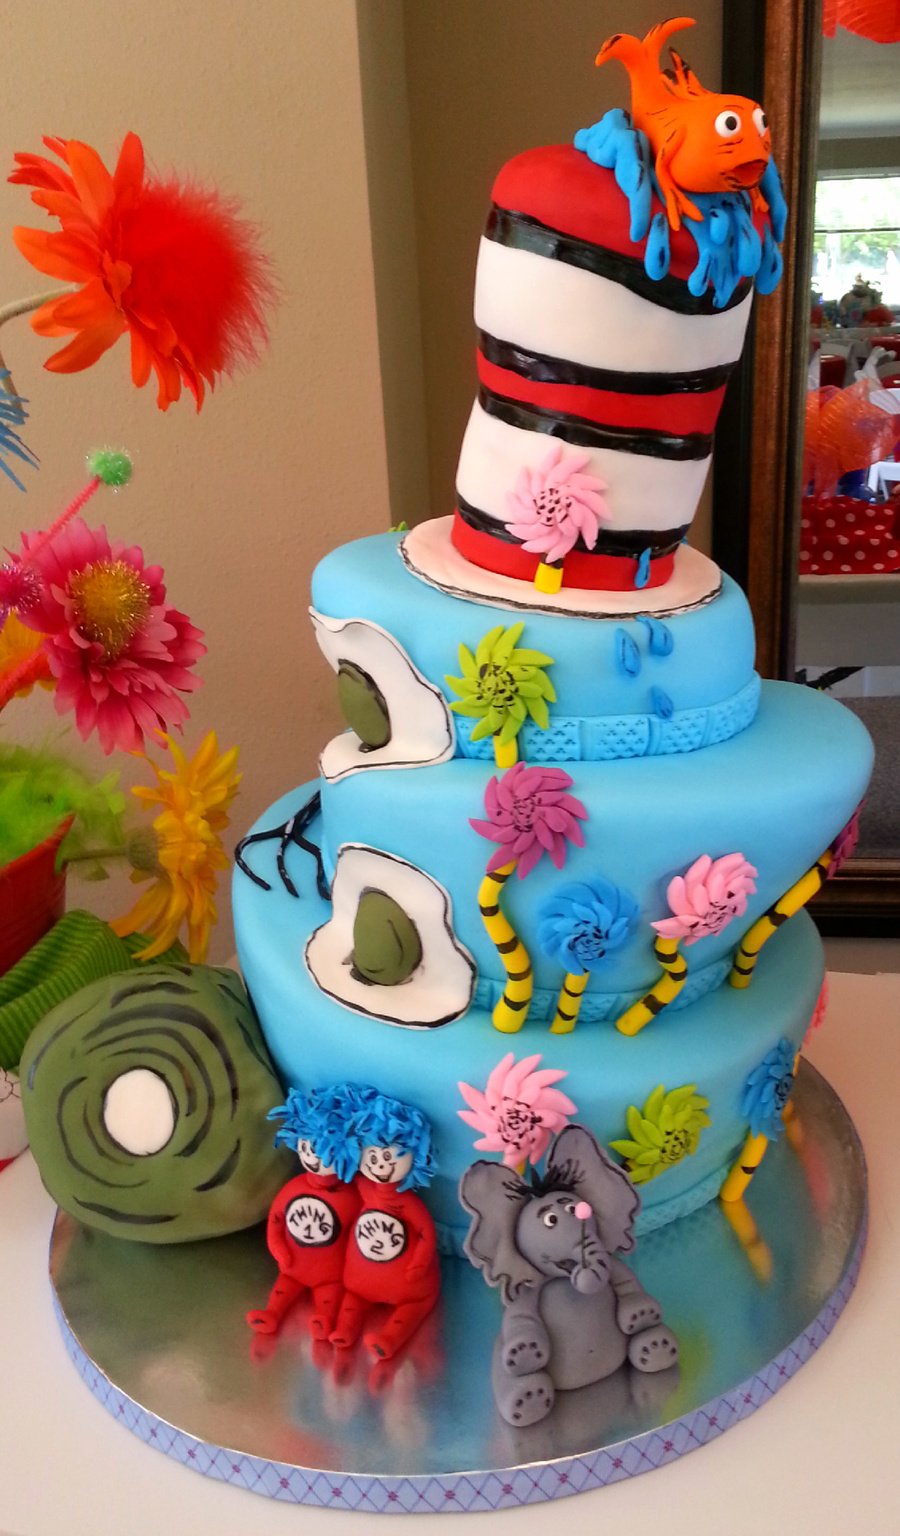 Dr Seuss Cake All Decorations Made Of Fondant